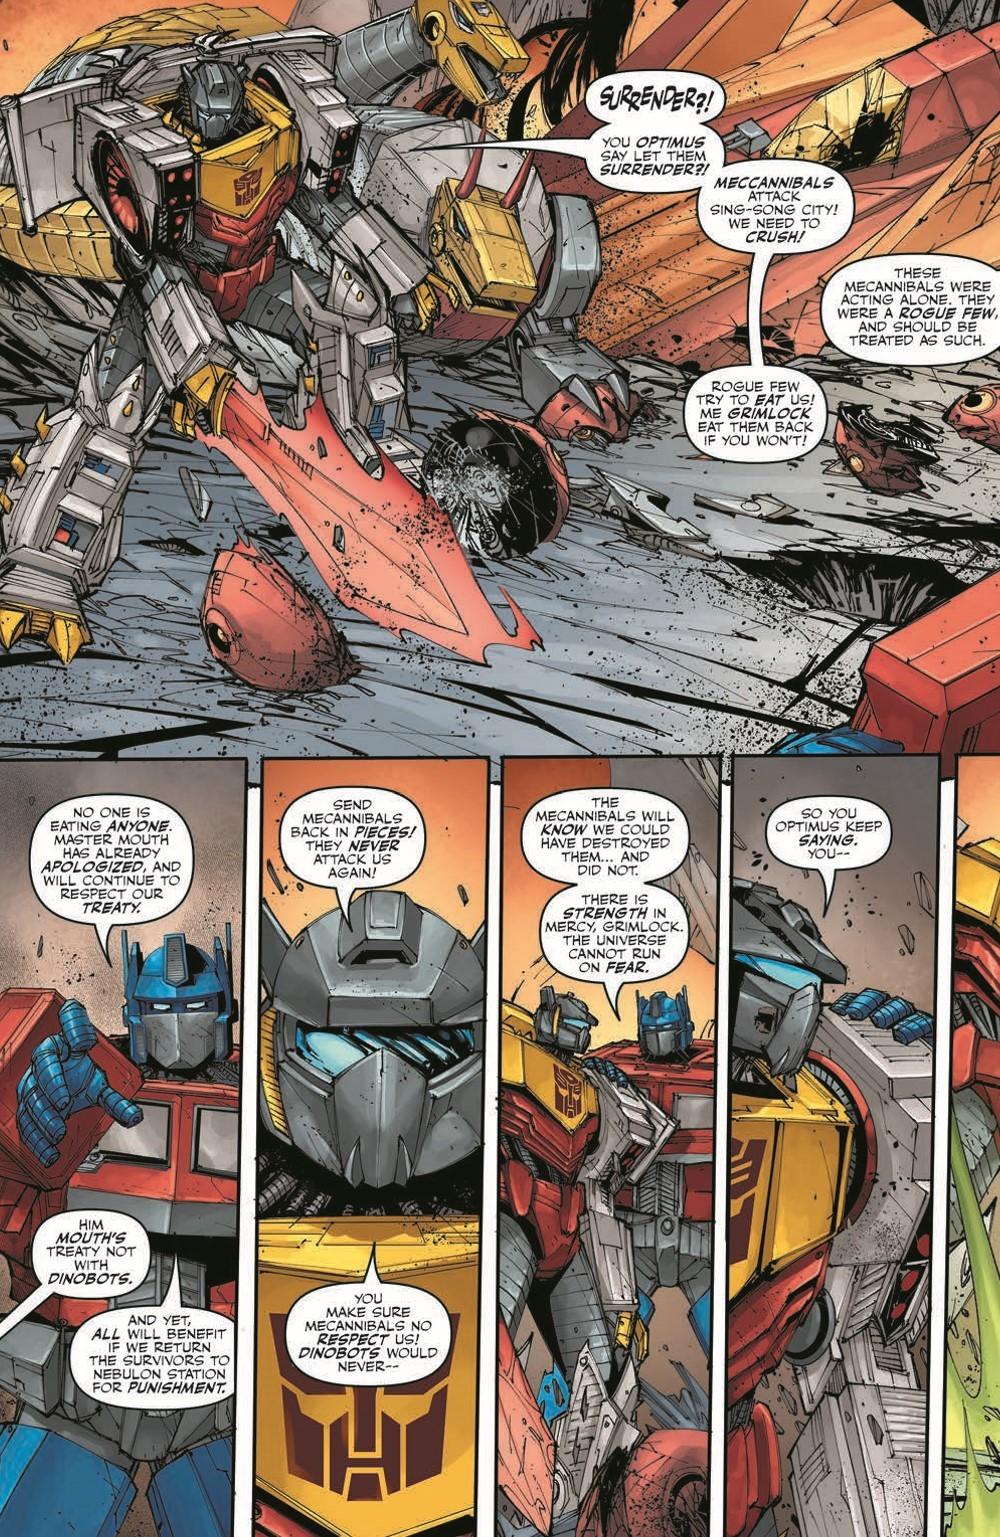 TFKingGrimlock01_pr-4 ComicList Previews: TRANSFORMERS KING GRIMLOCK #1 (OF 5)